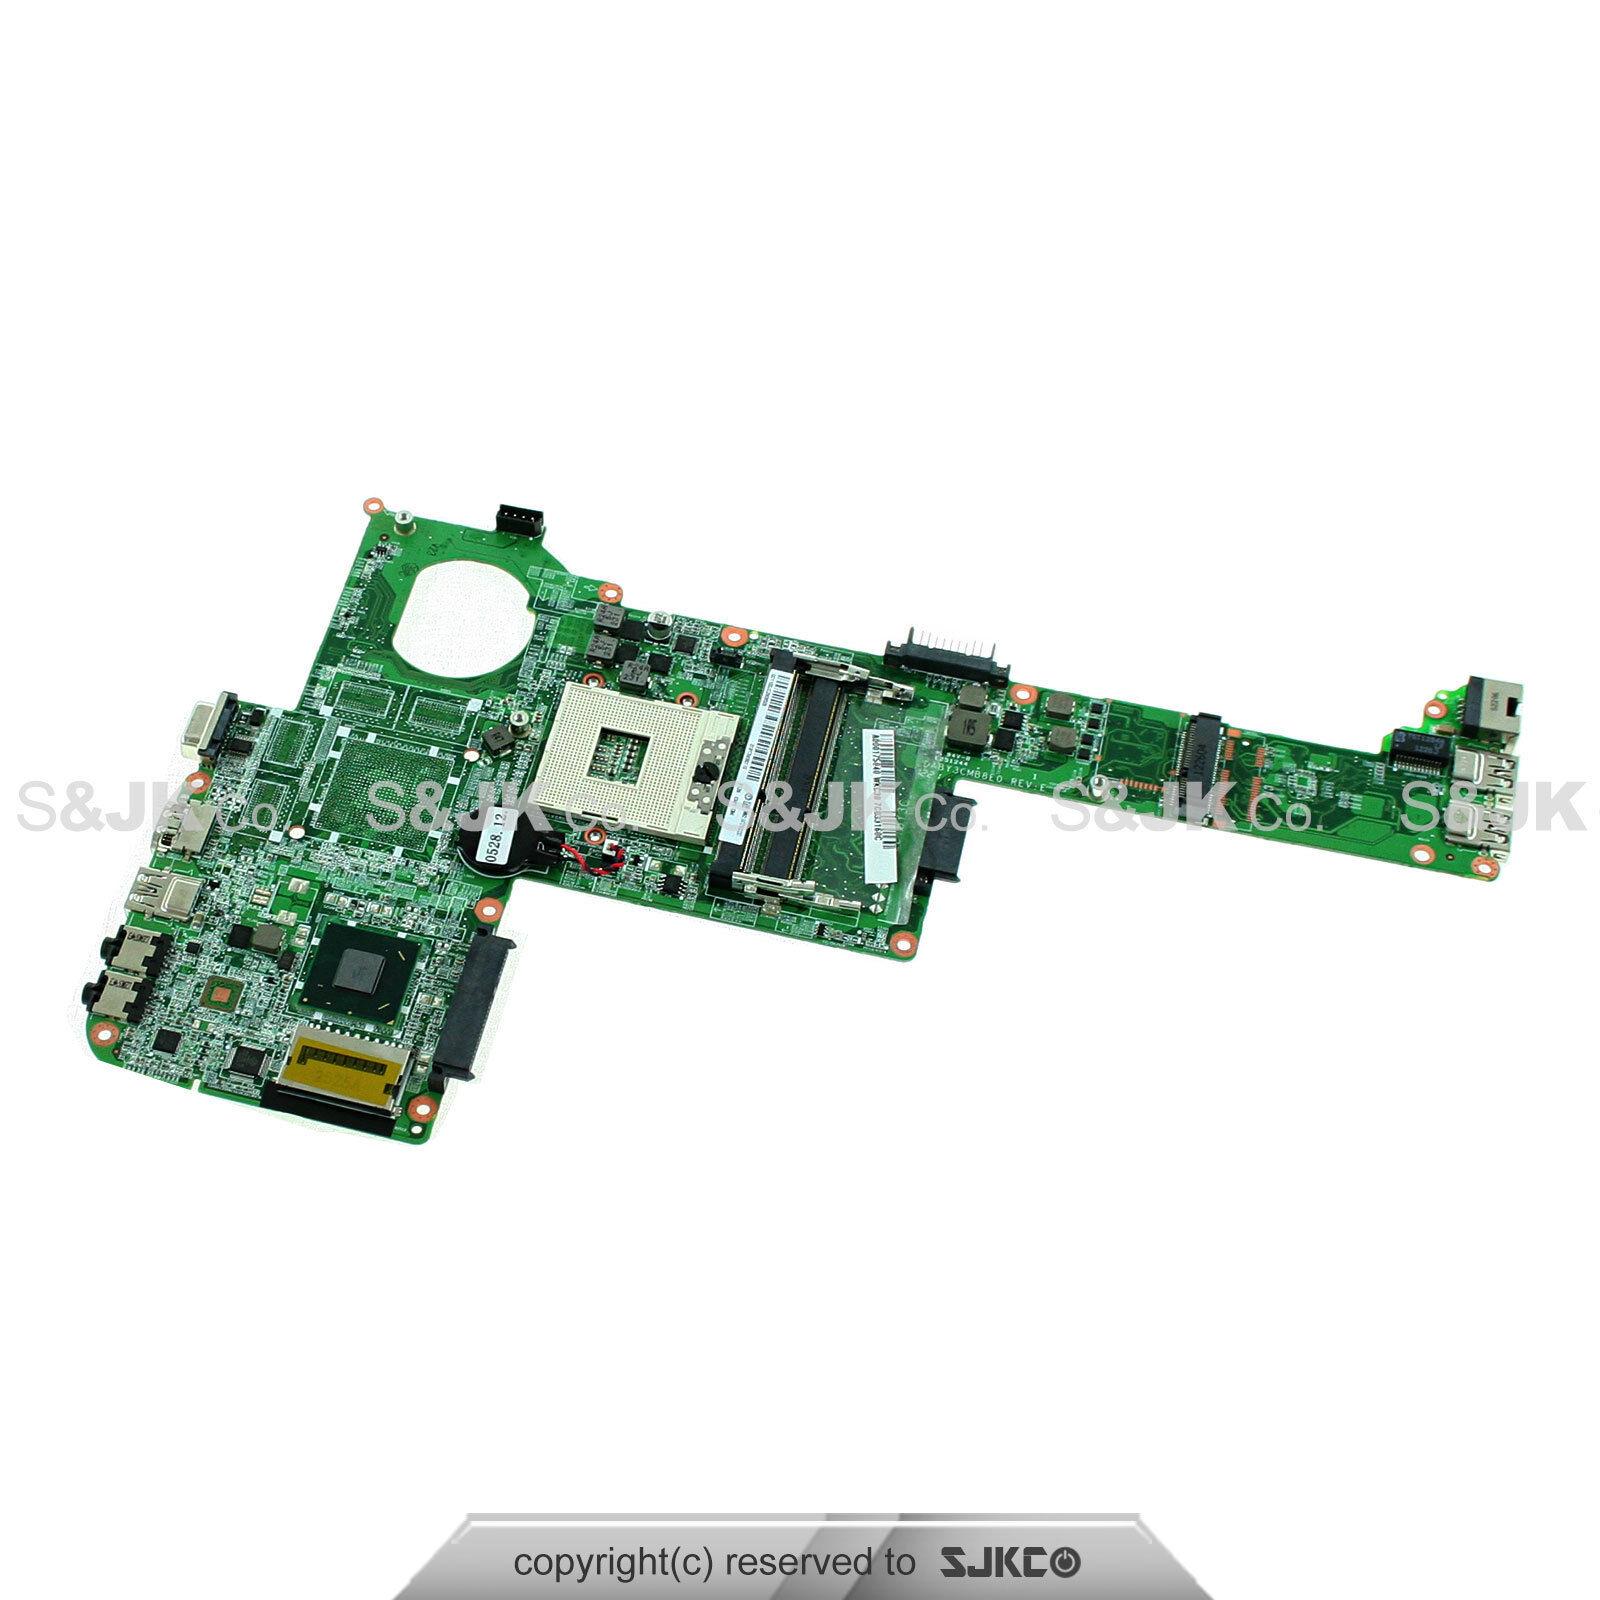 Toshiba Satellite C840 C845 Intel Hm70 Motherboard Daby3c...